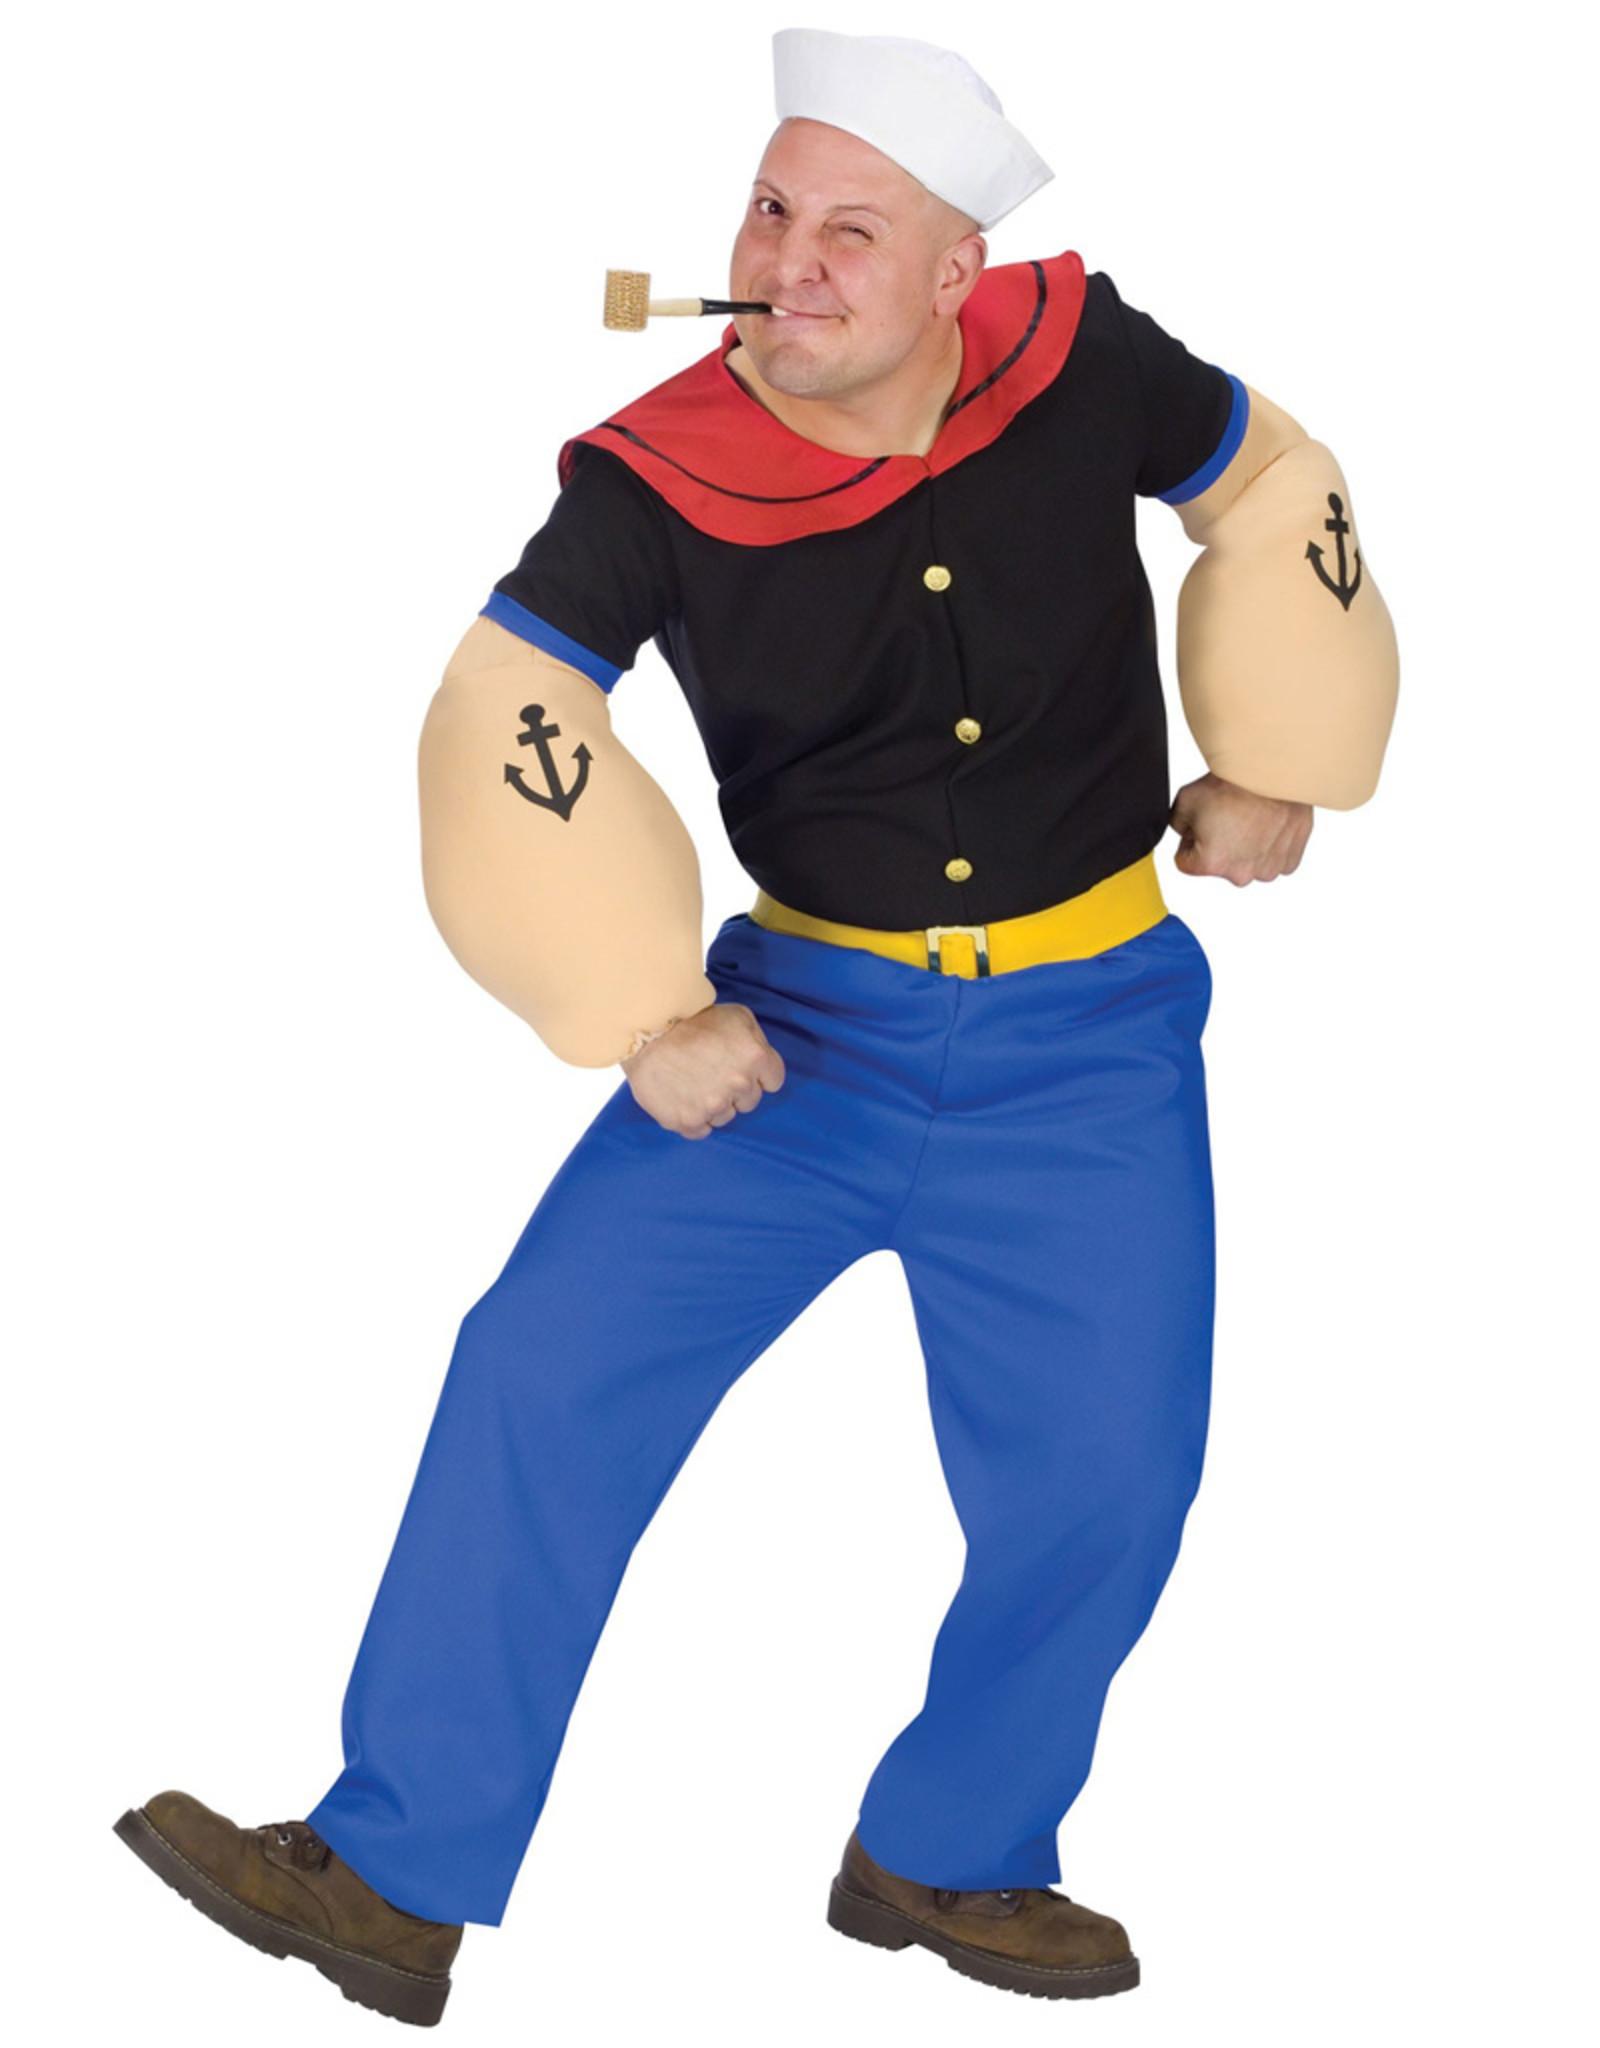 Popeye Costume - Men's